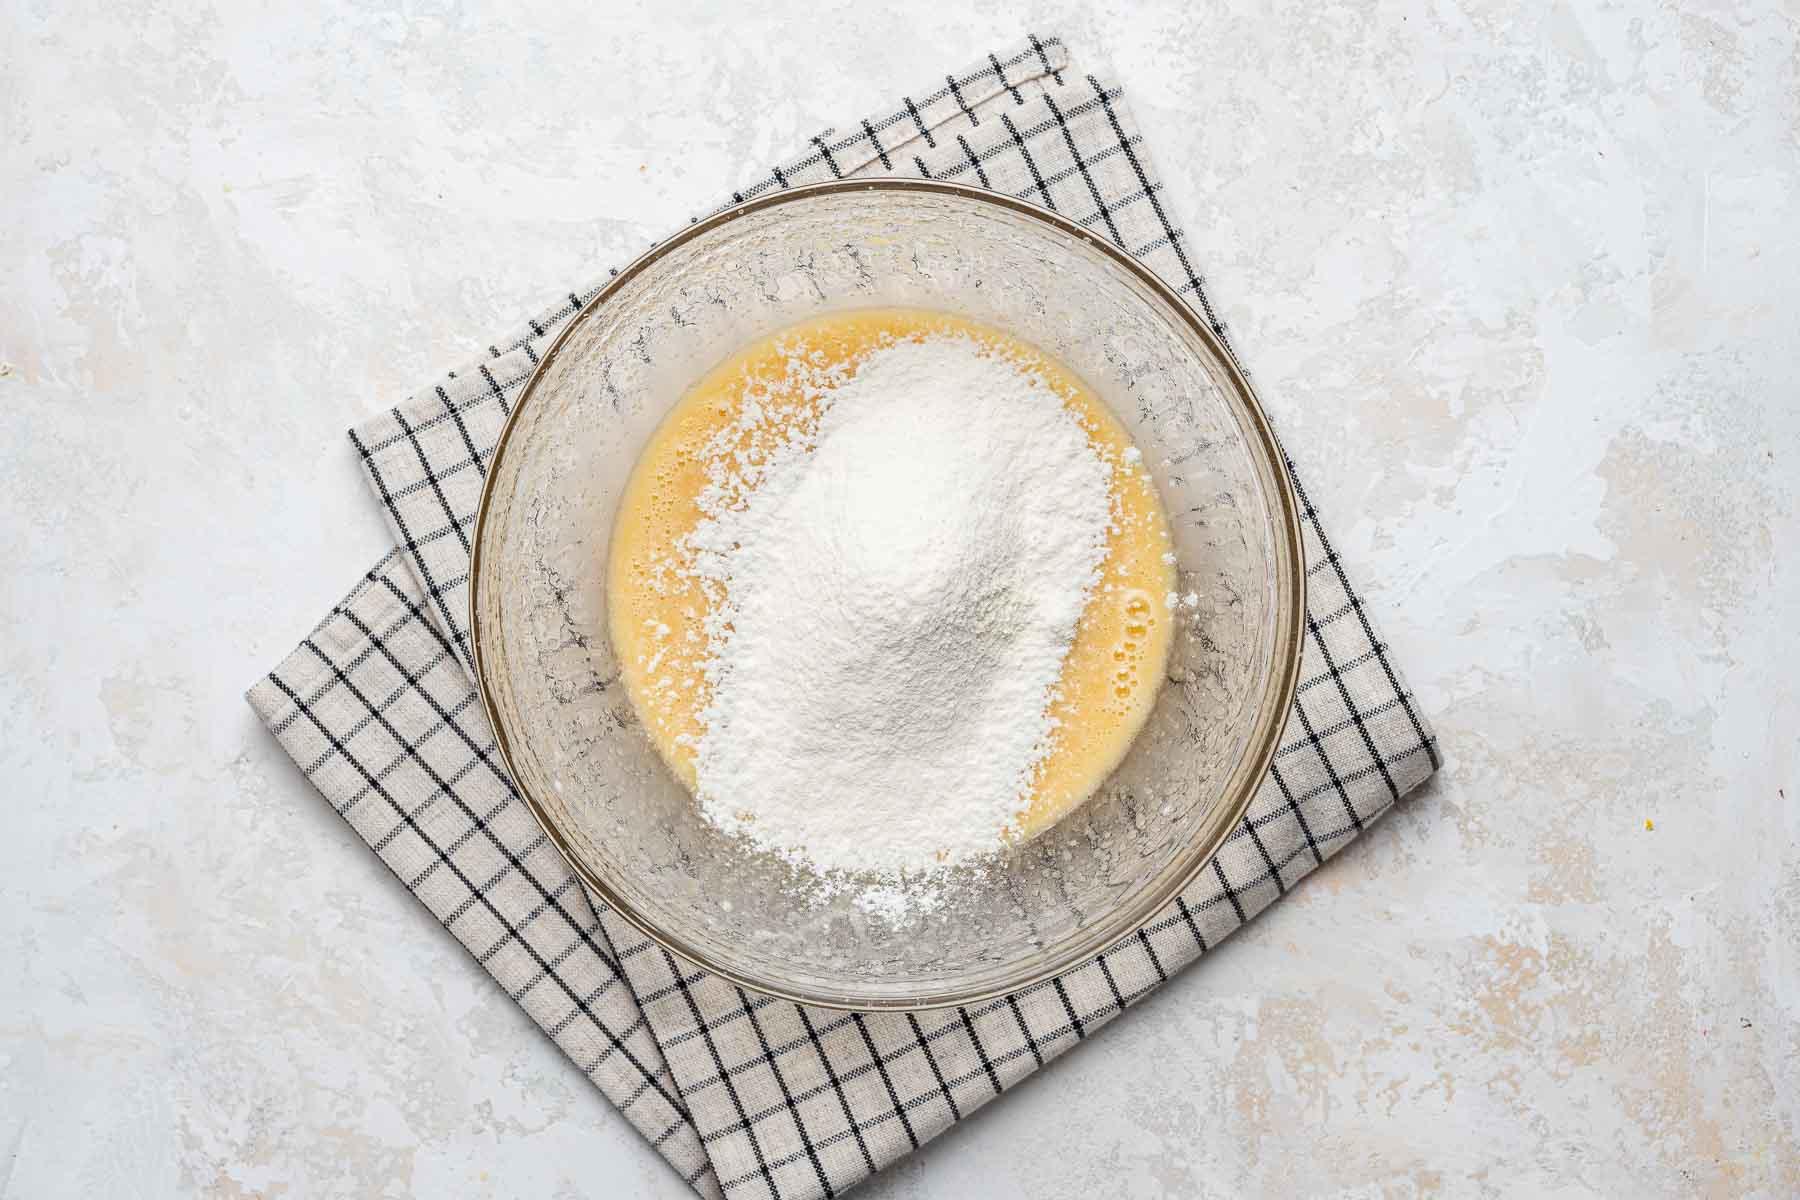 Flour on cupcake batter in bowl.